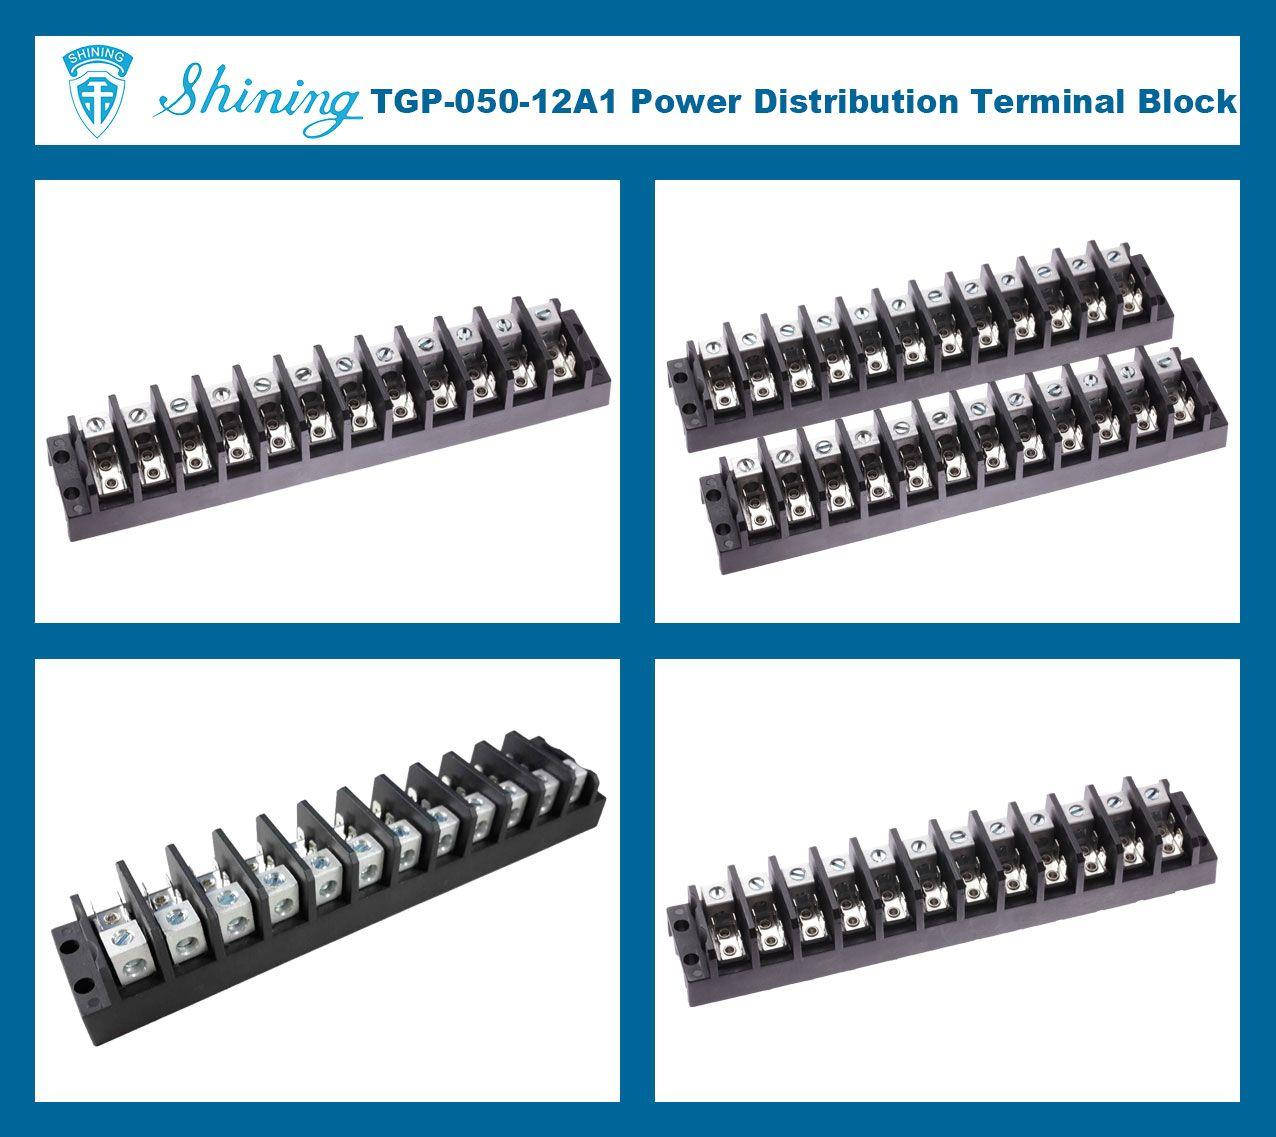 TGP-050-12A1 600V 50A 12 Pole Electrical Power Terminal Block